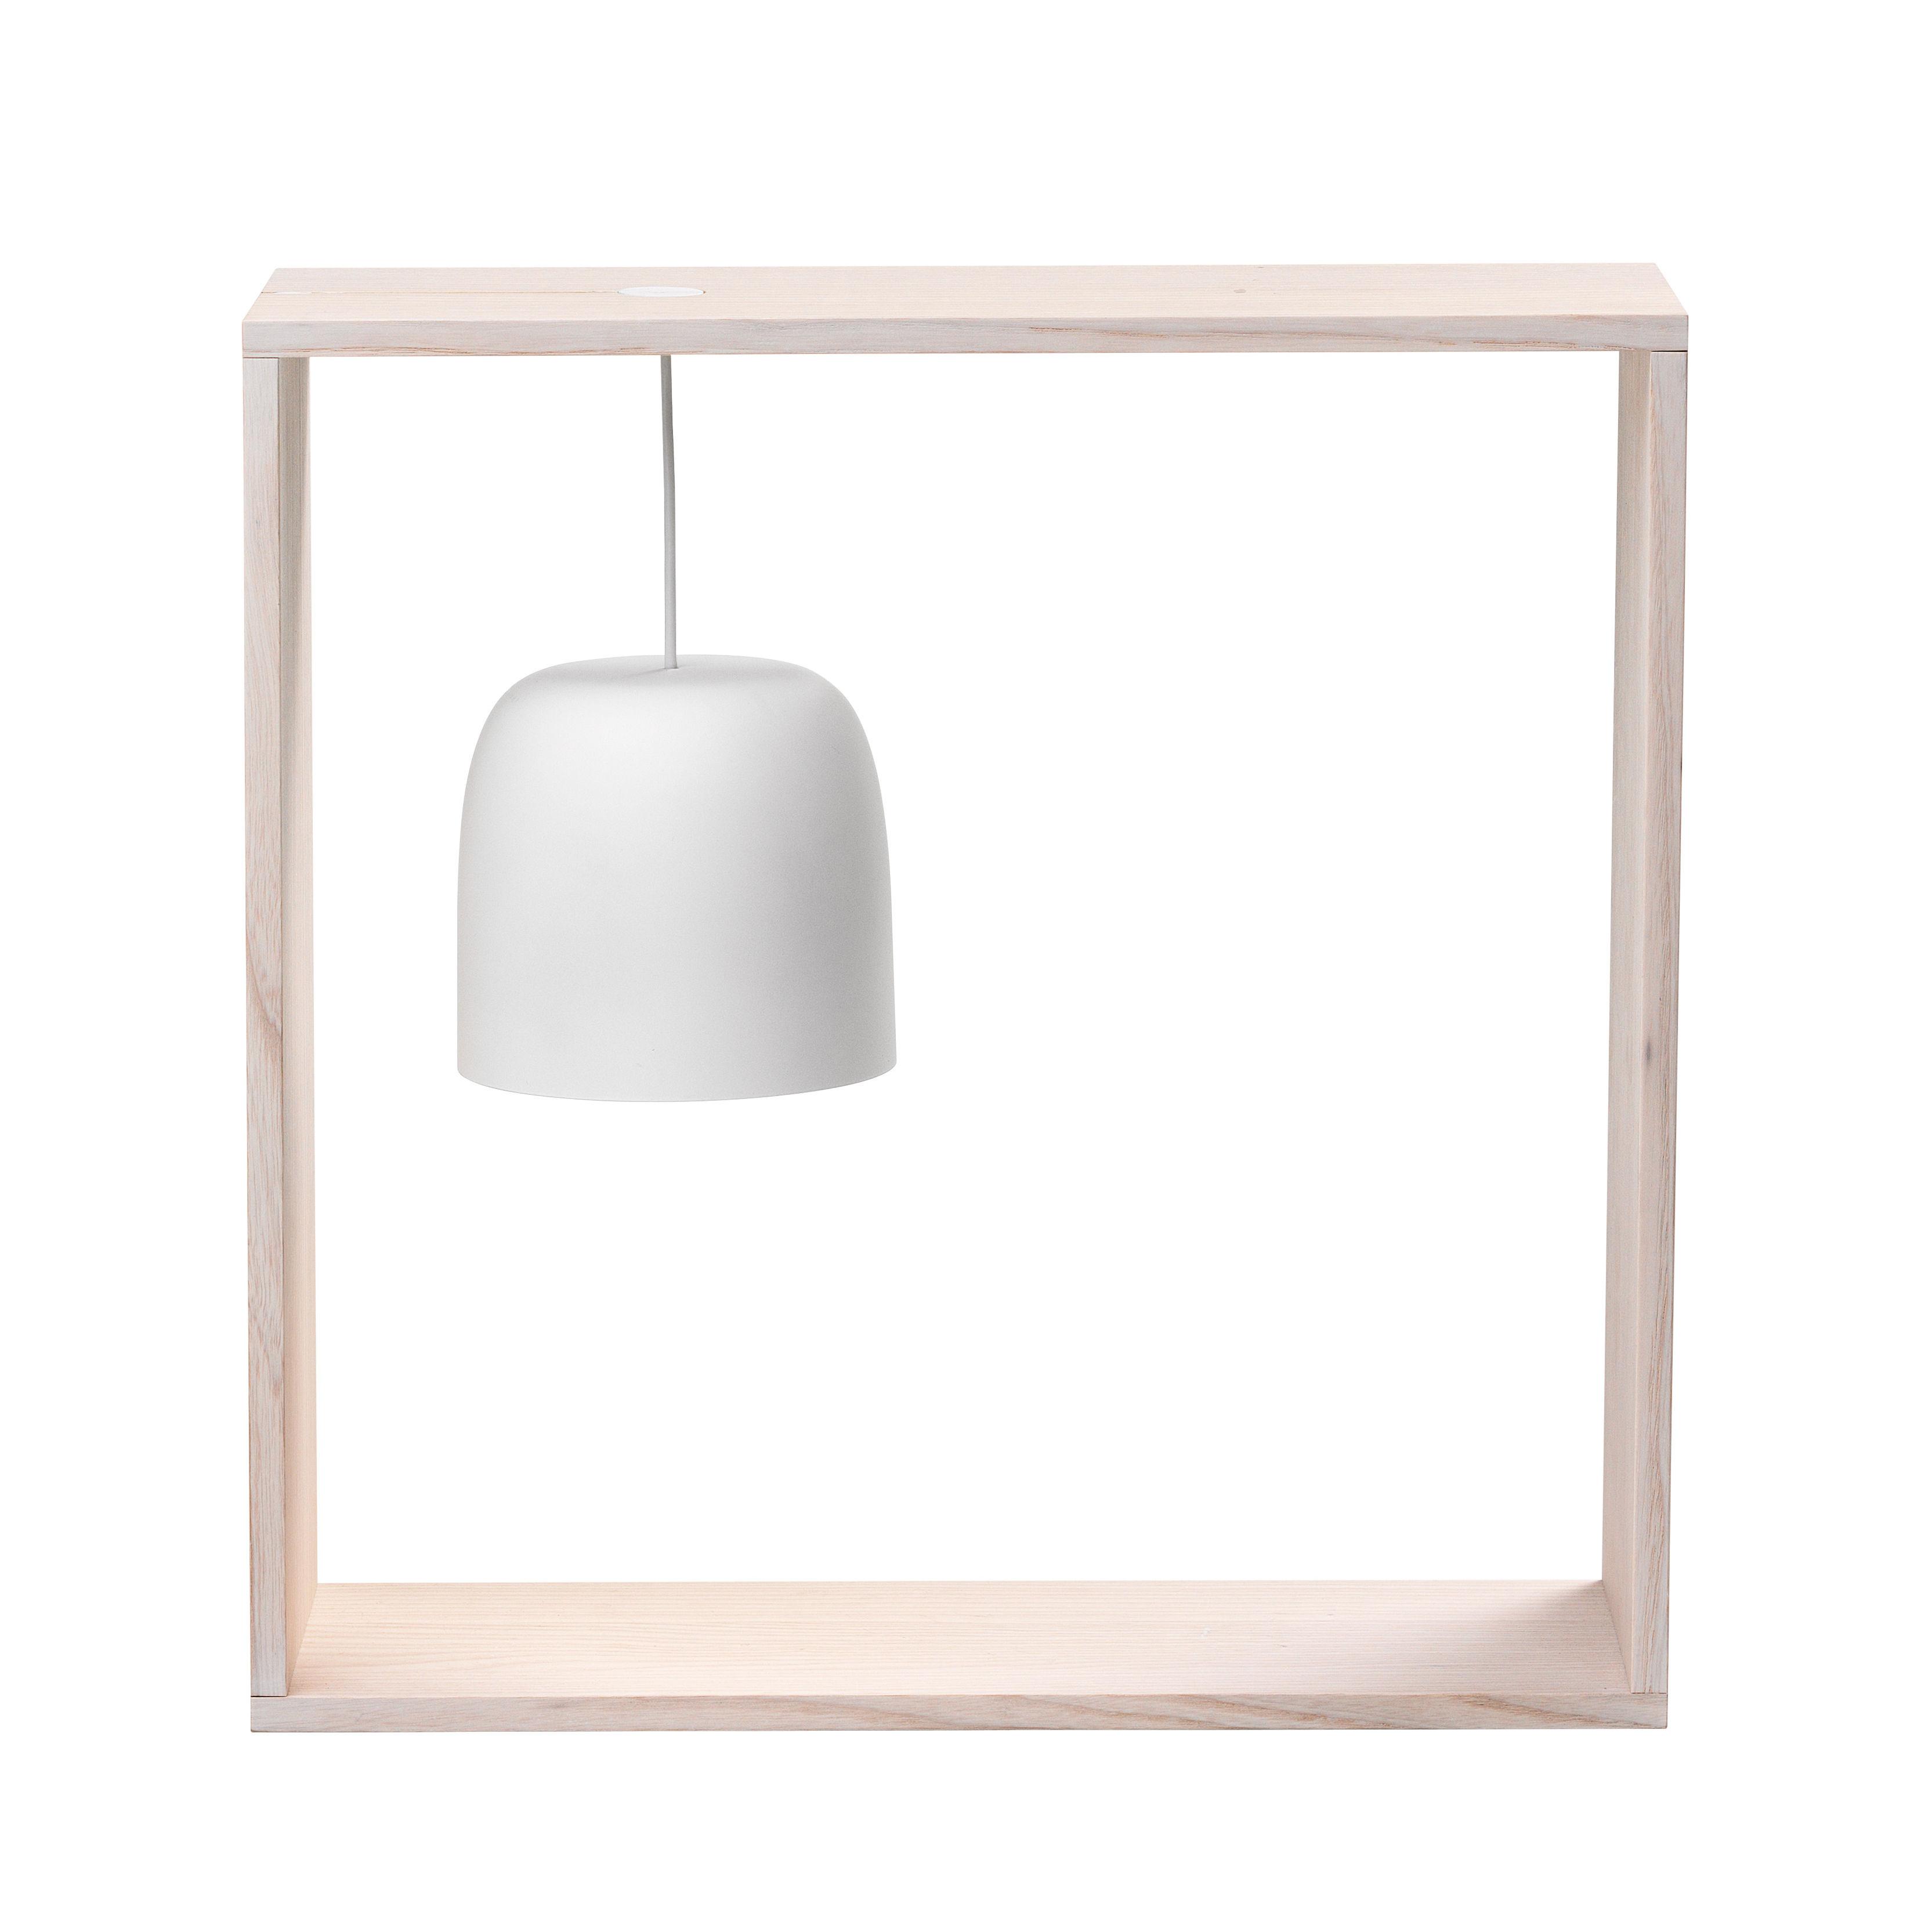 Luminaire - Lampes de table - Lampe Gaku / Diffuseur suspendu - Flos - Frêne / Abat-jour blanc - Frêne massif naturel, Polycarbonate